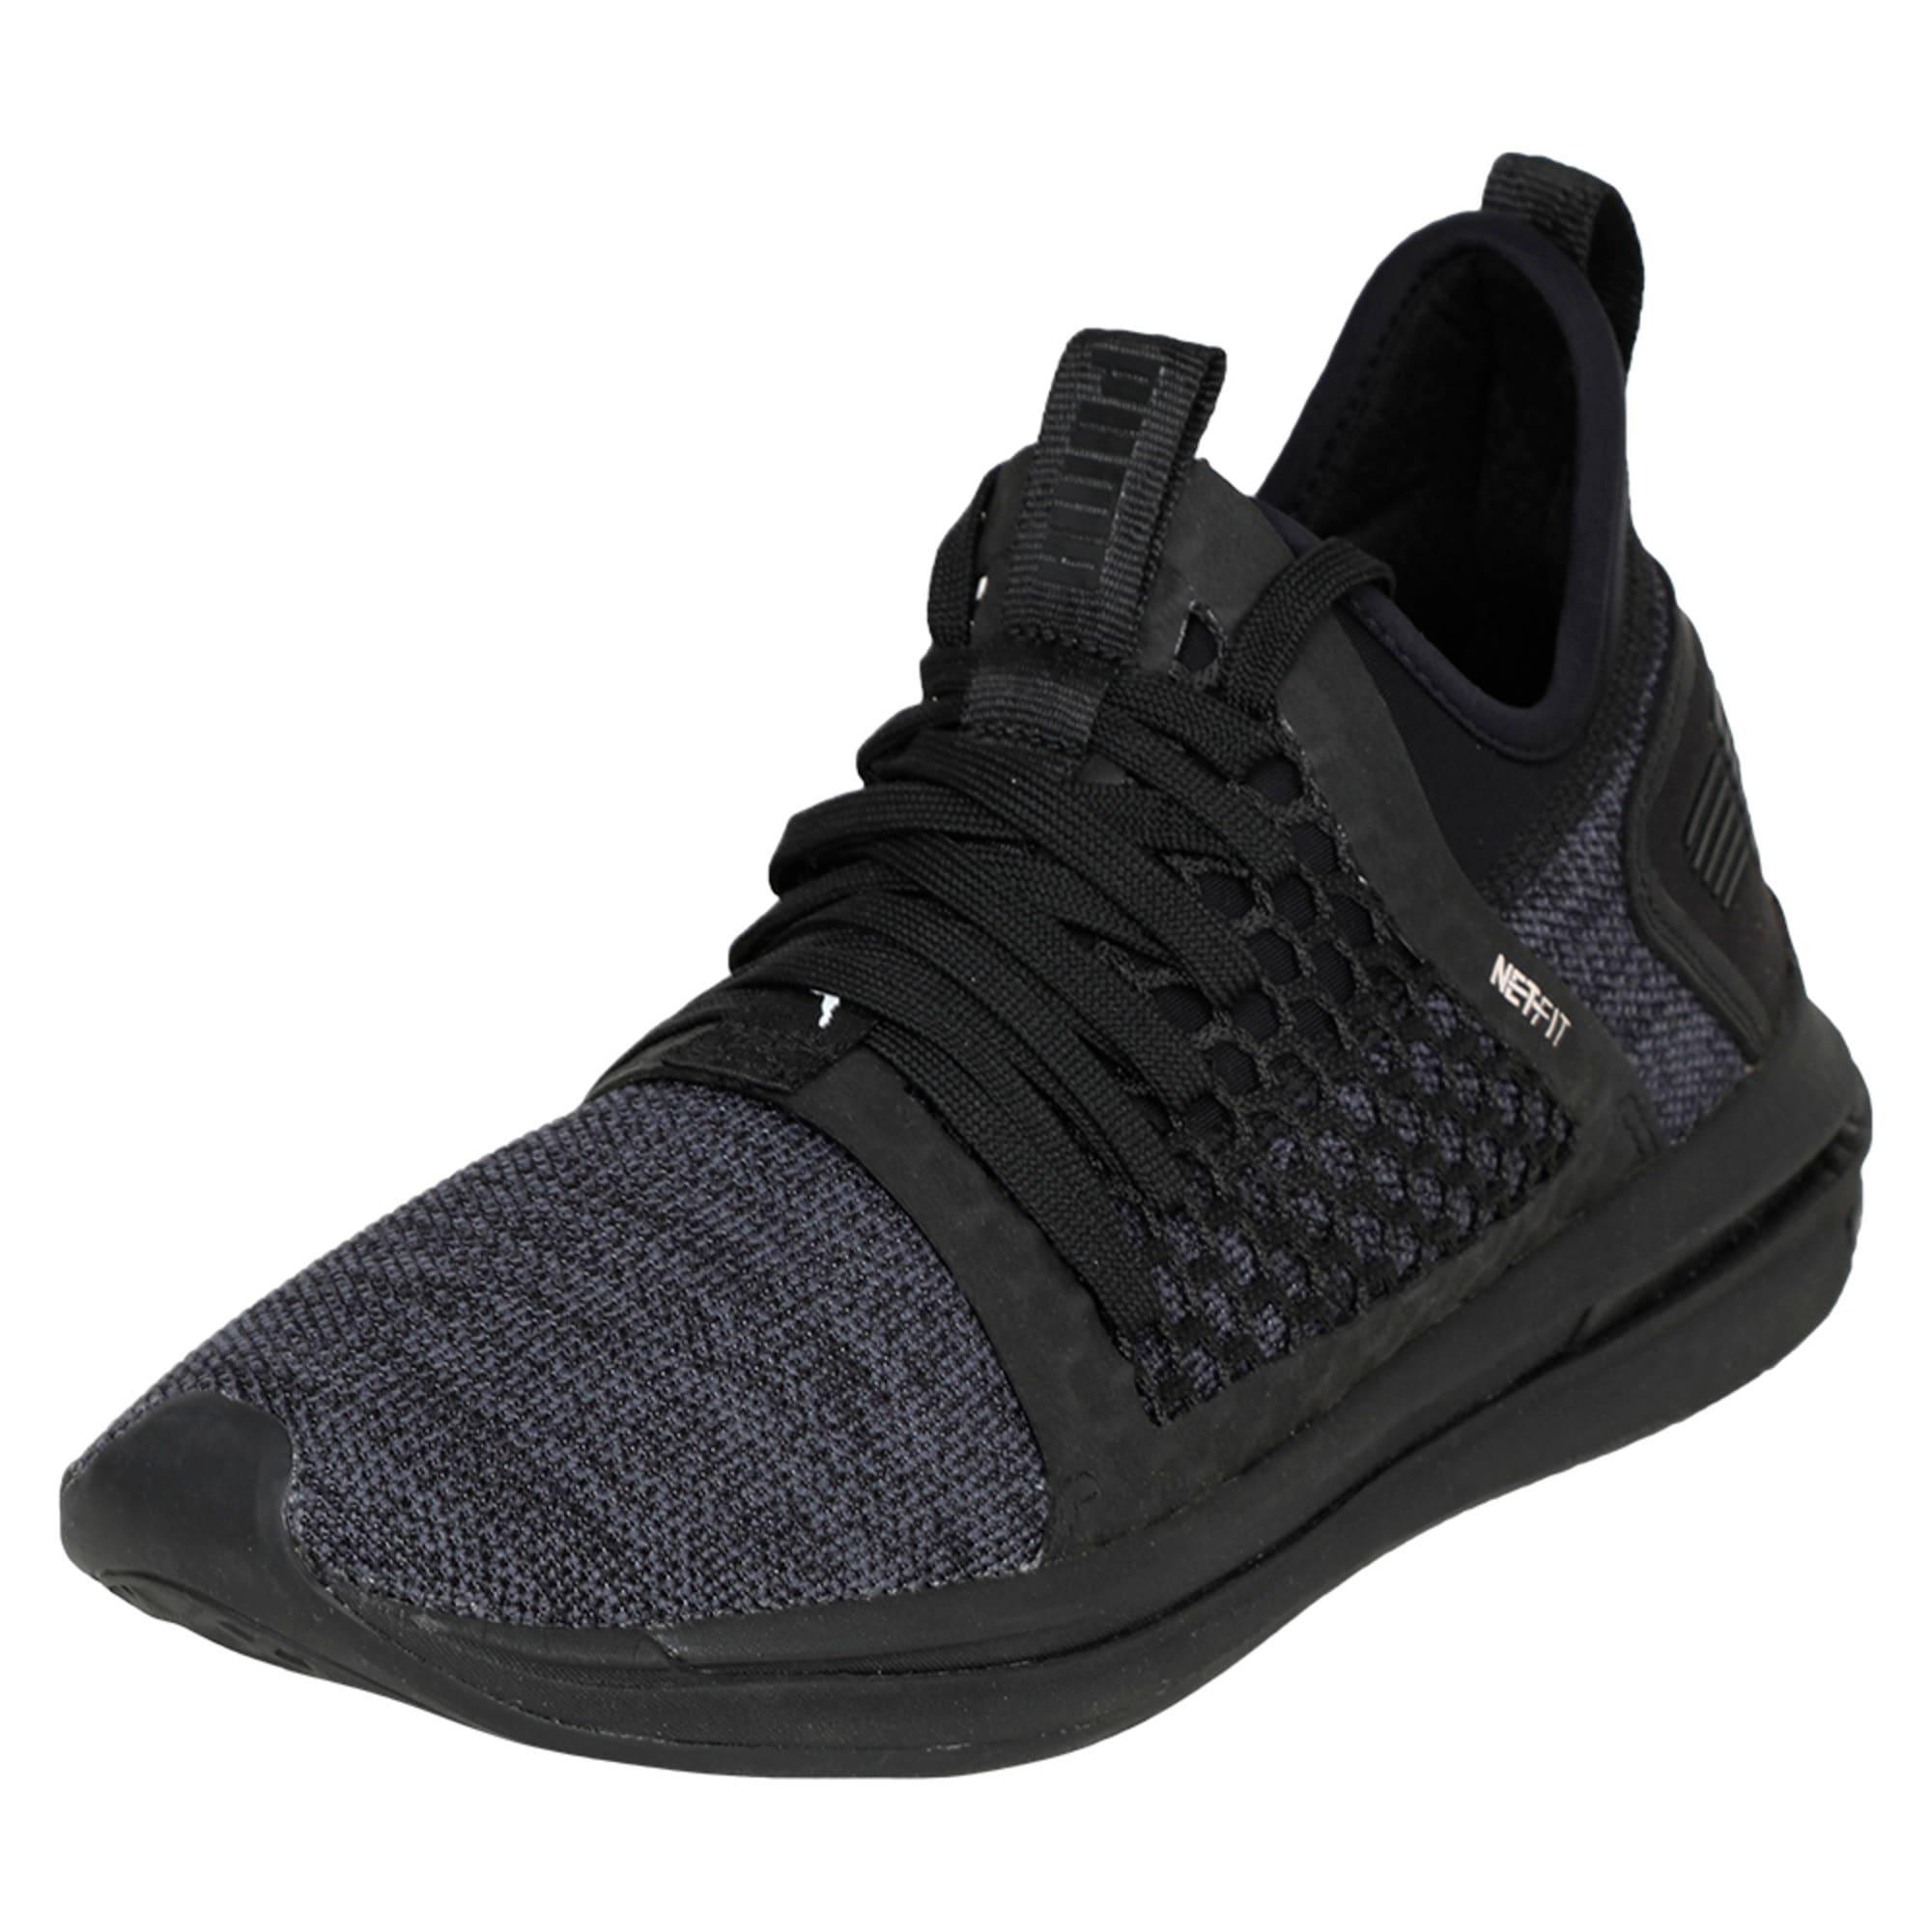 Thumbnail 1 of IGNITE Limitless SR NETFIT Men's Trainer Shoes, Puma Black, medium-IND